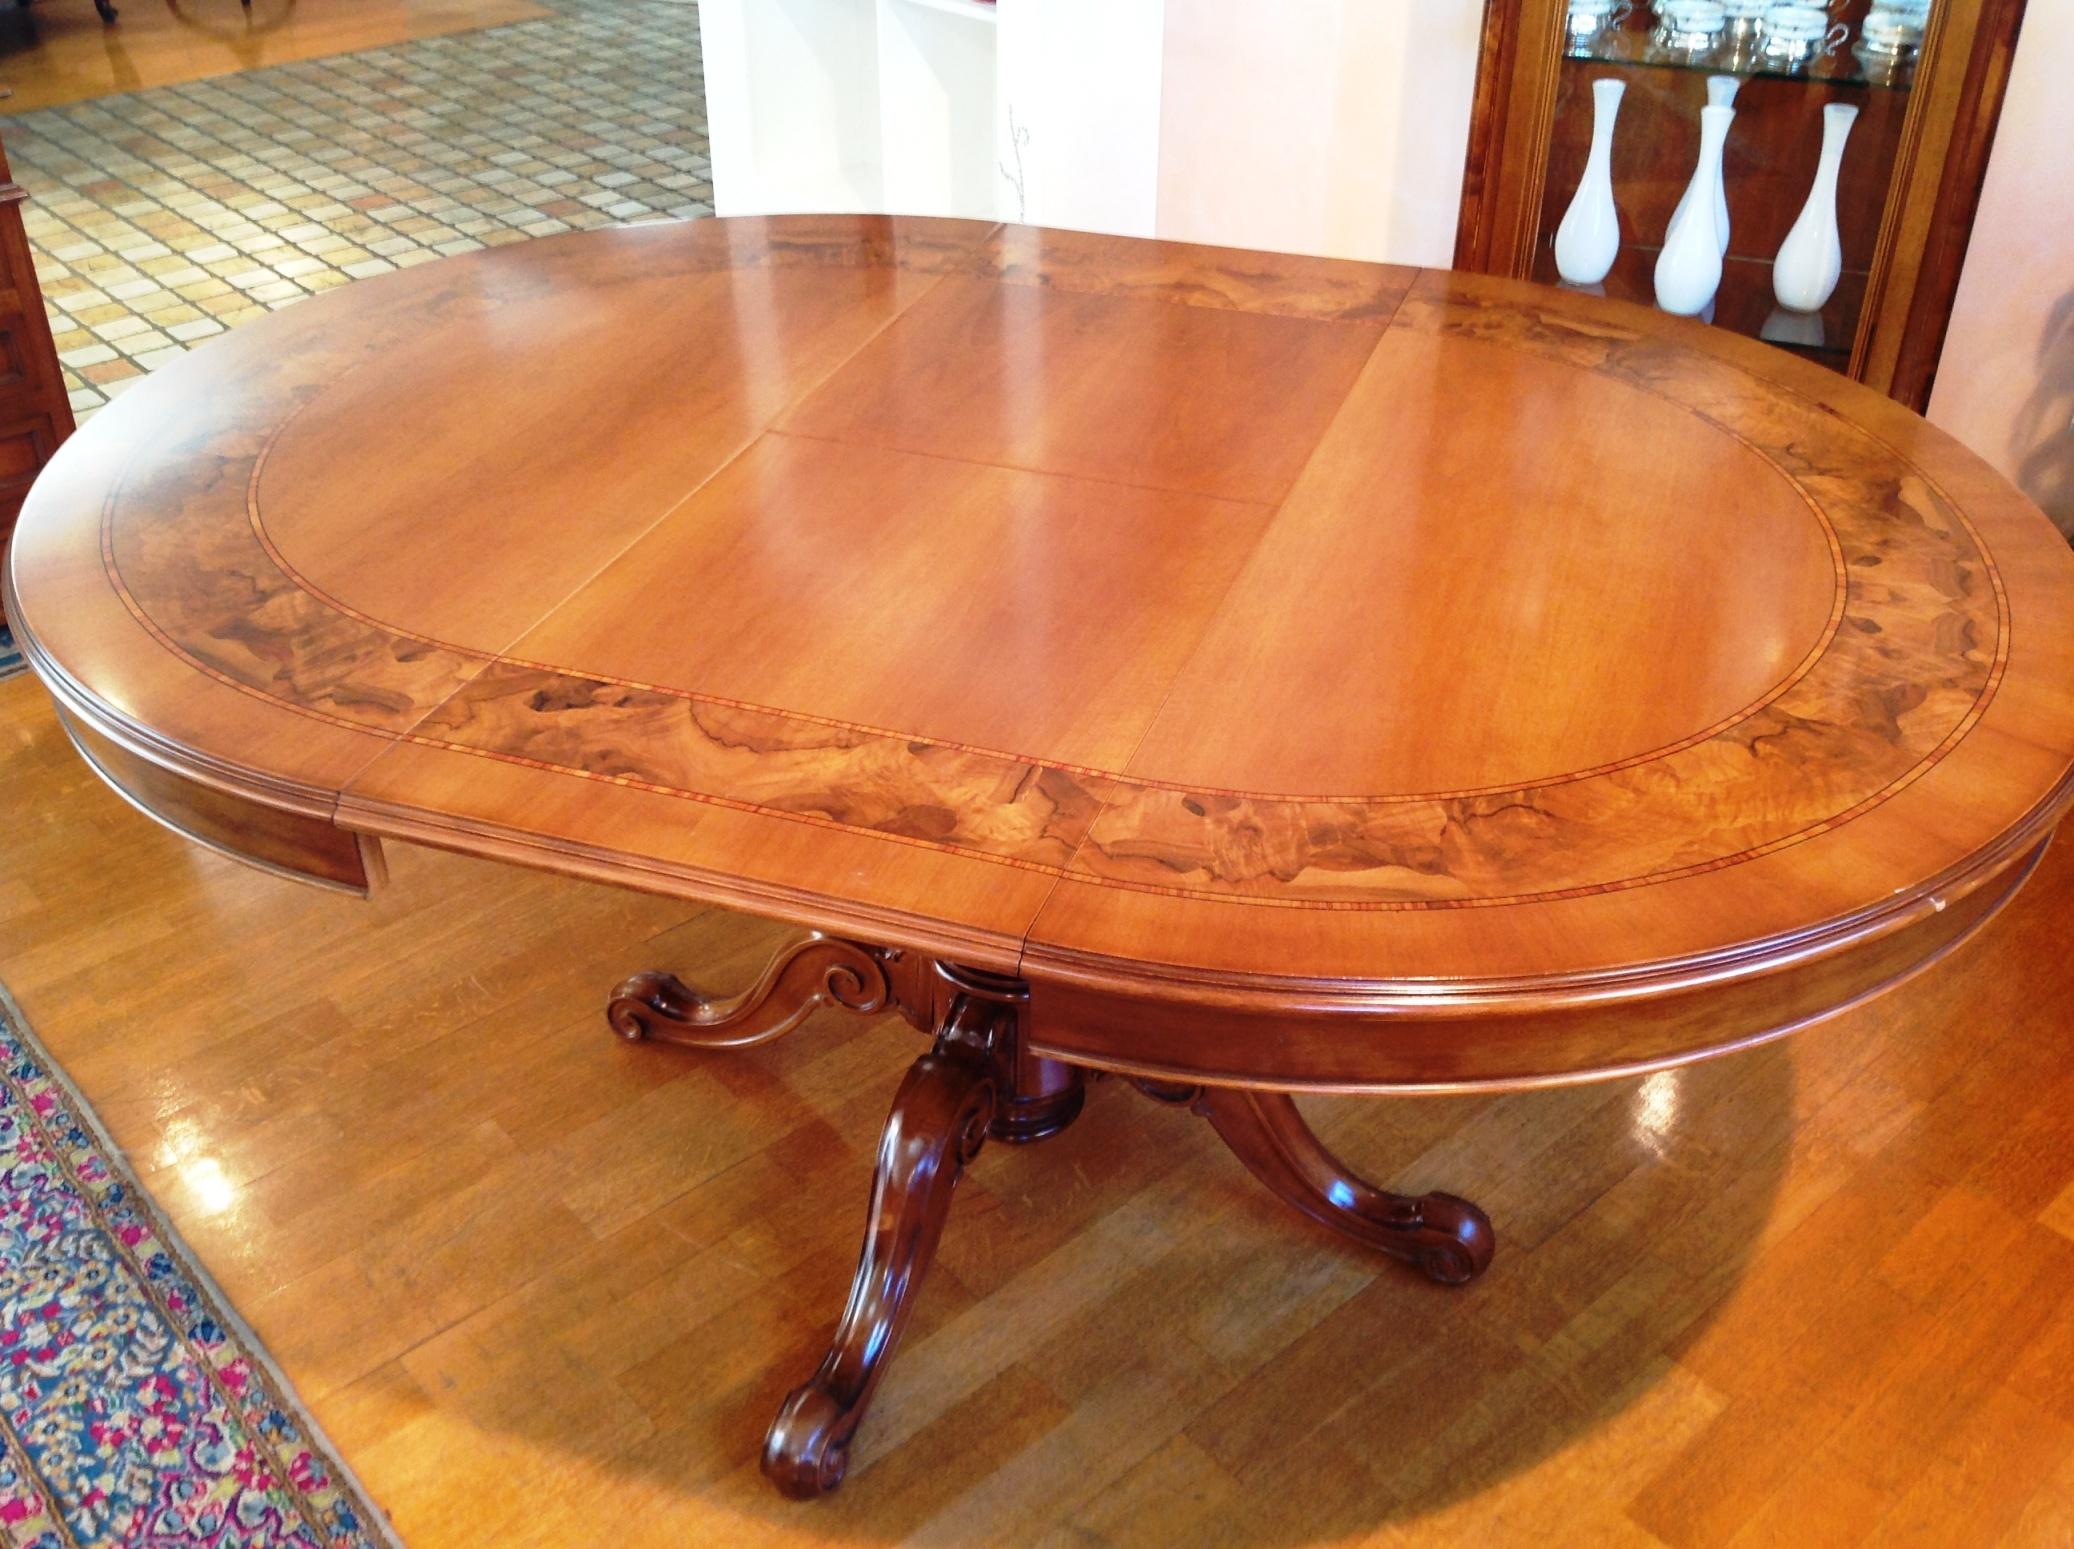 Tavoli da pranzo ovali moderni tavoli in cristallo per il for Tavoli moderni ovali